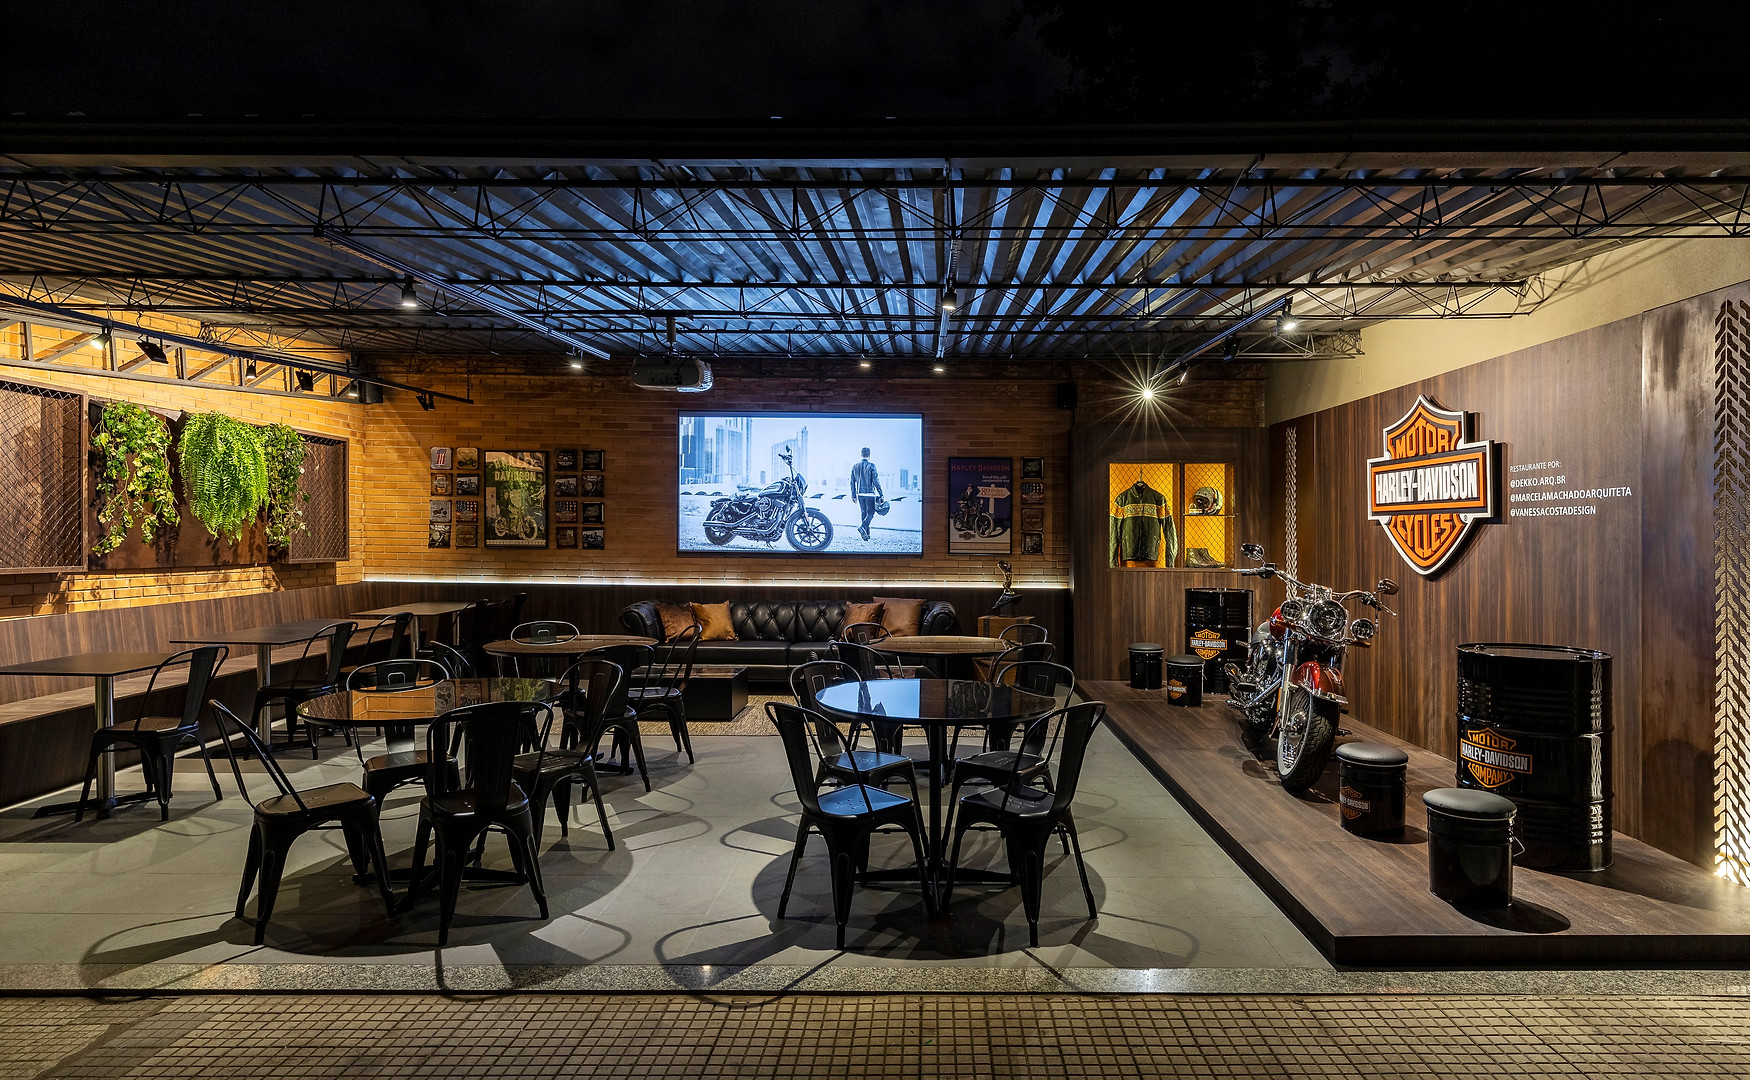 Restaurante Harley-Davidson - Morar Mais BH 2019